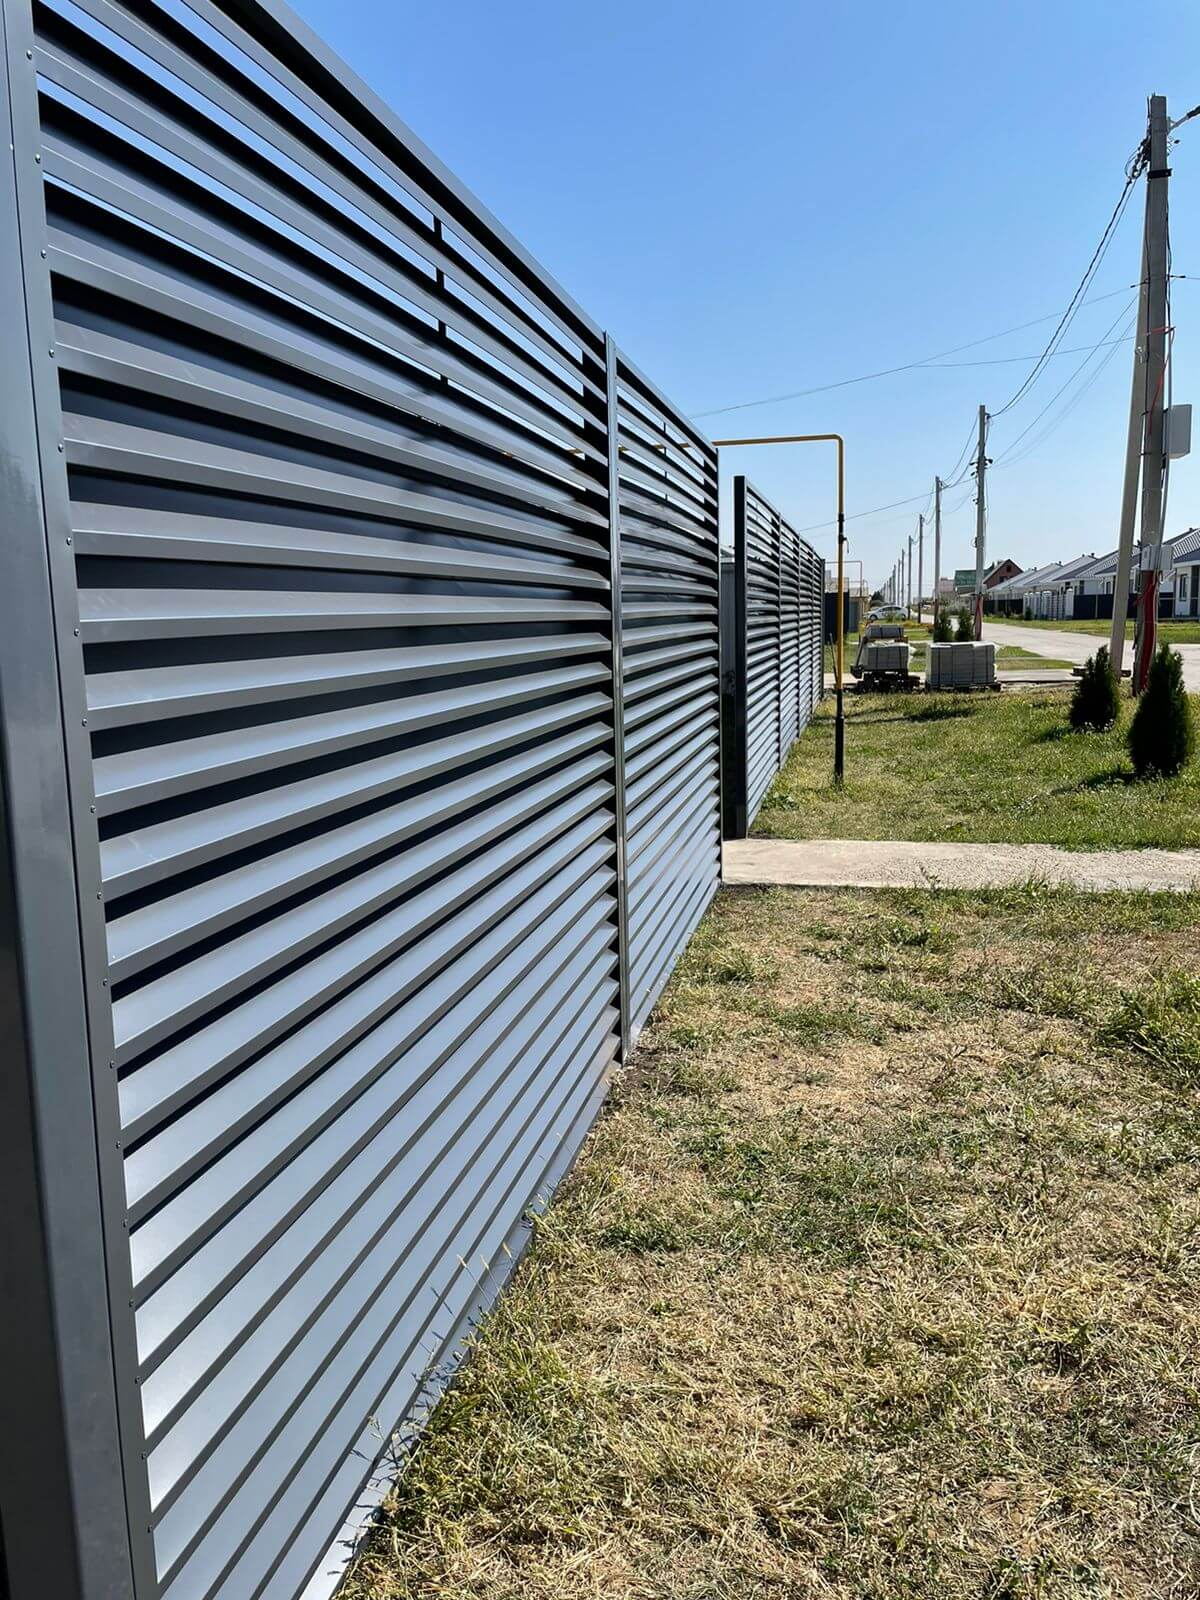 забор-жалюзи с ламелями эко-z ral7024/7024 серый графит двухсторонний фото3